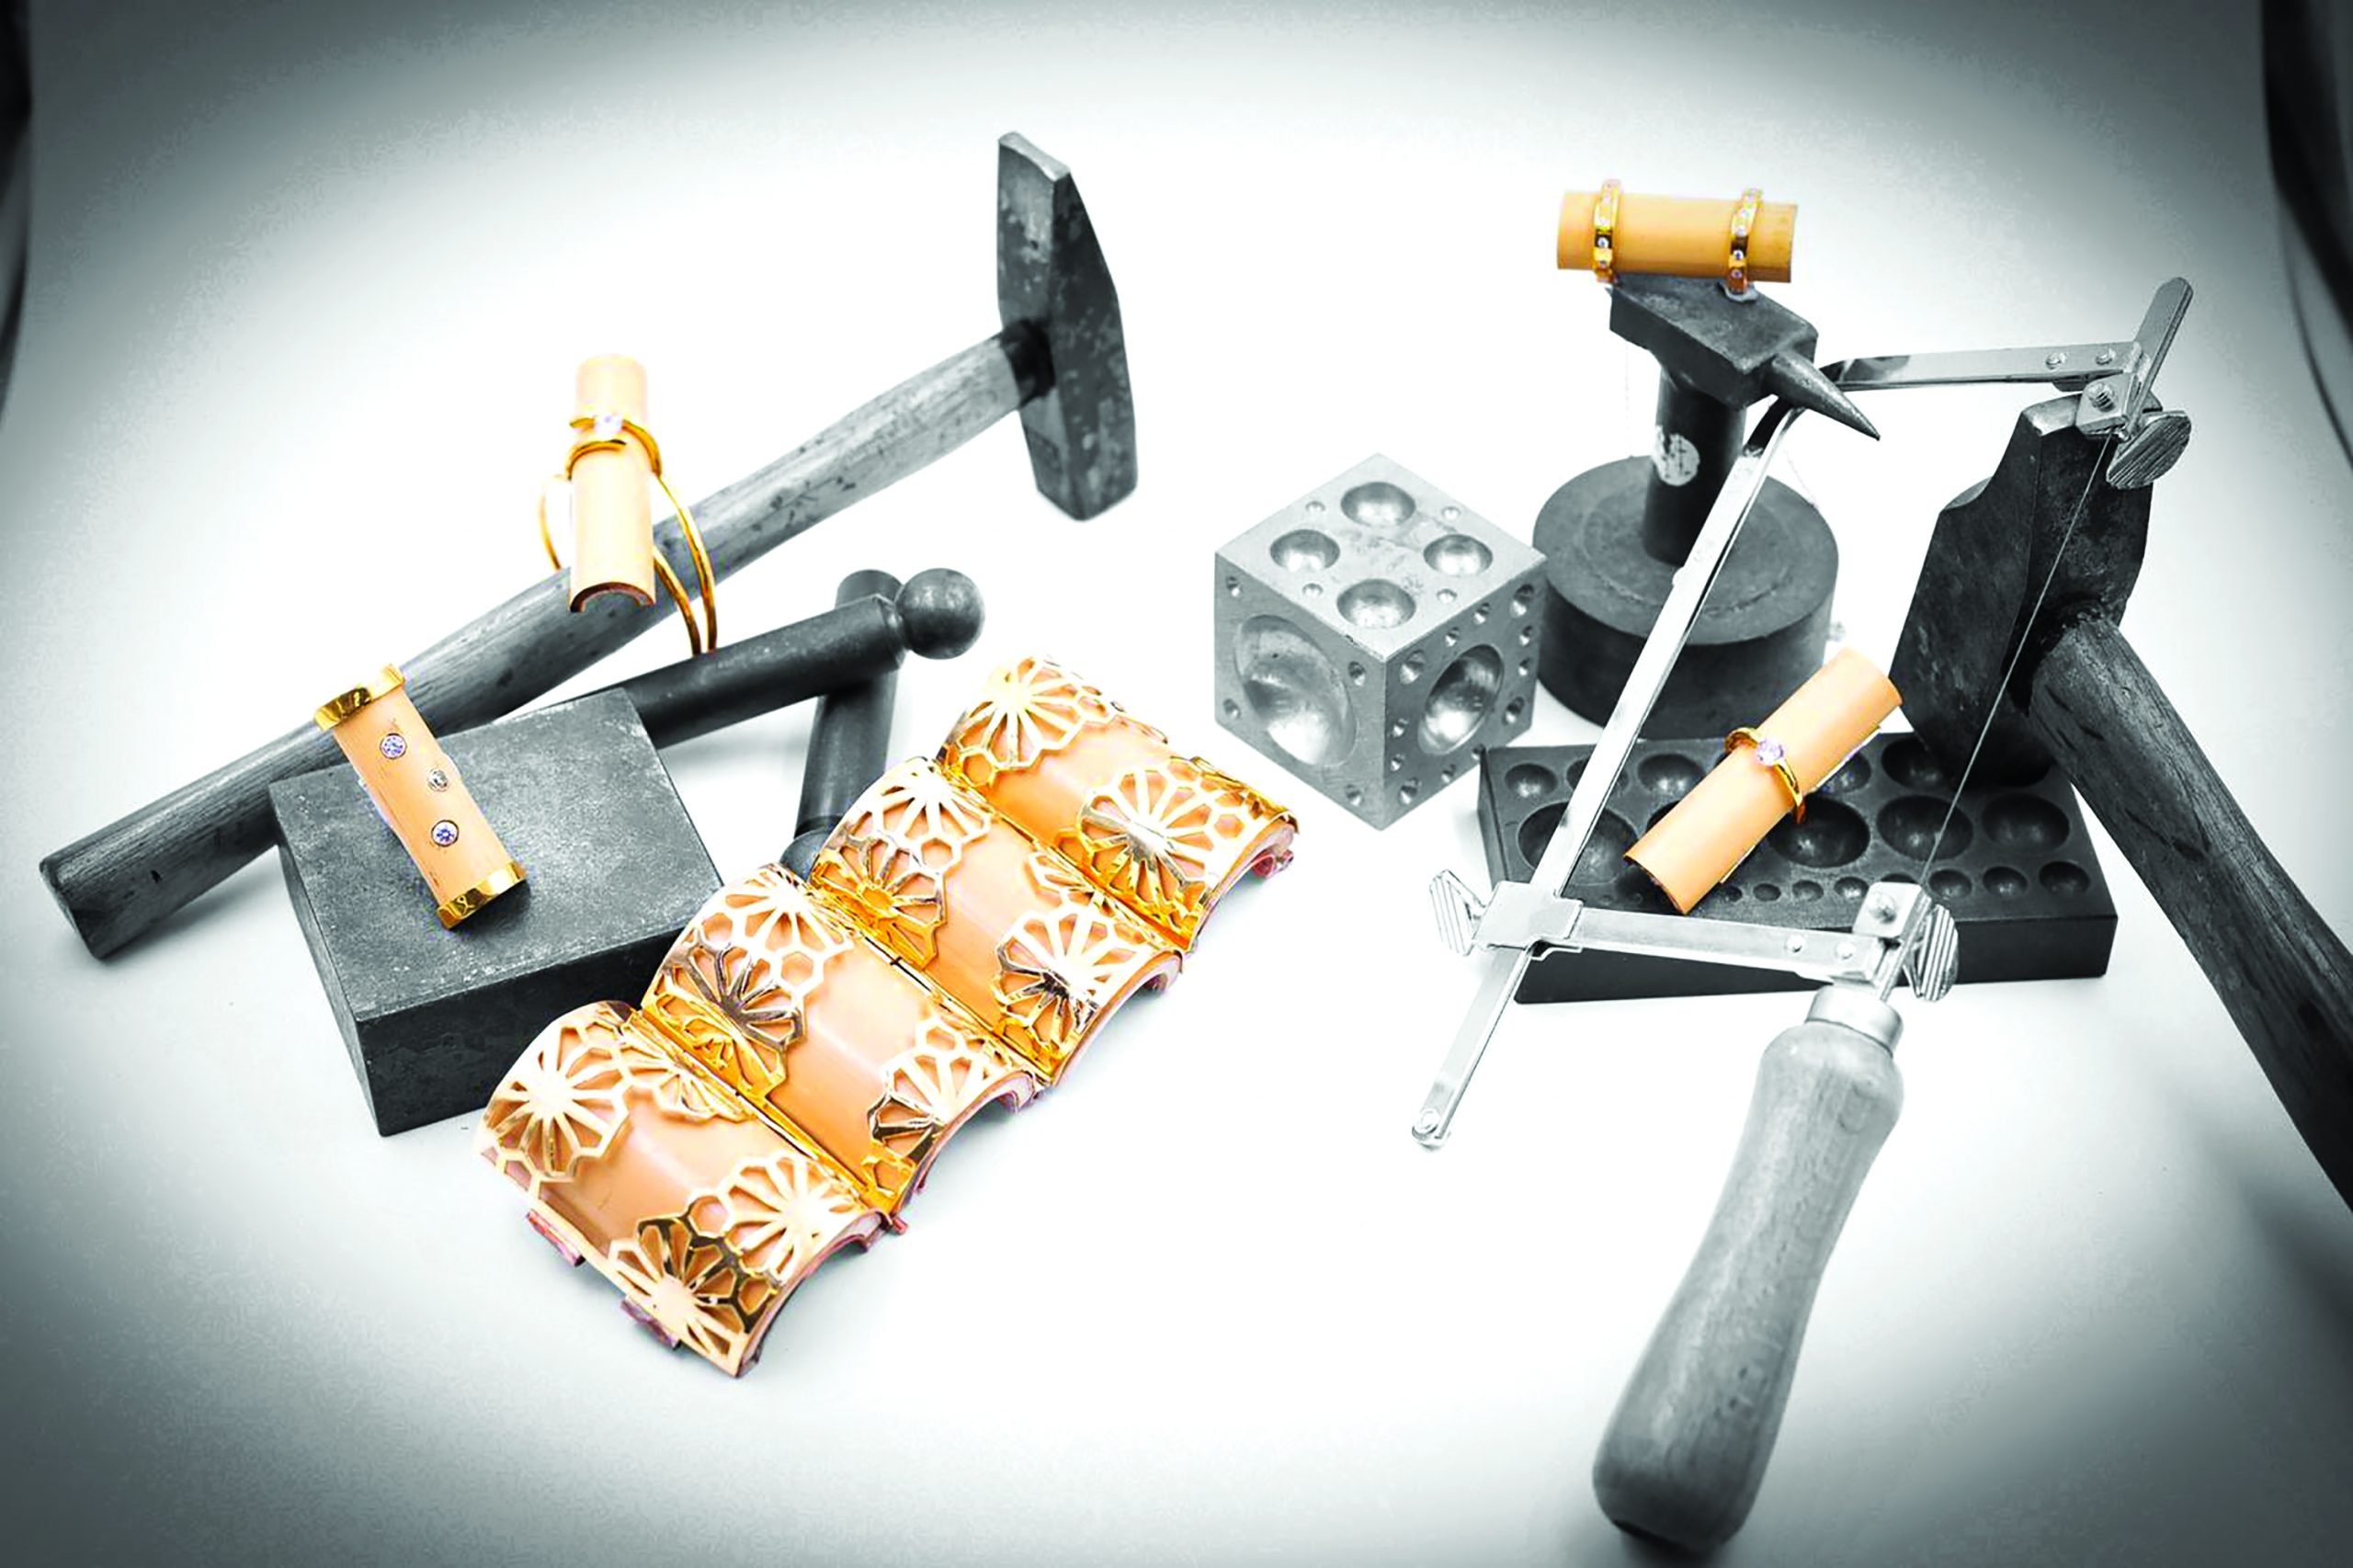 Sustainable jewellery design by Mifuyu Fukai